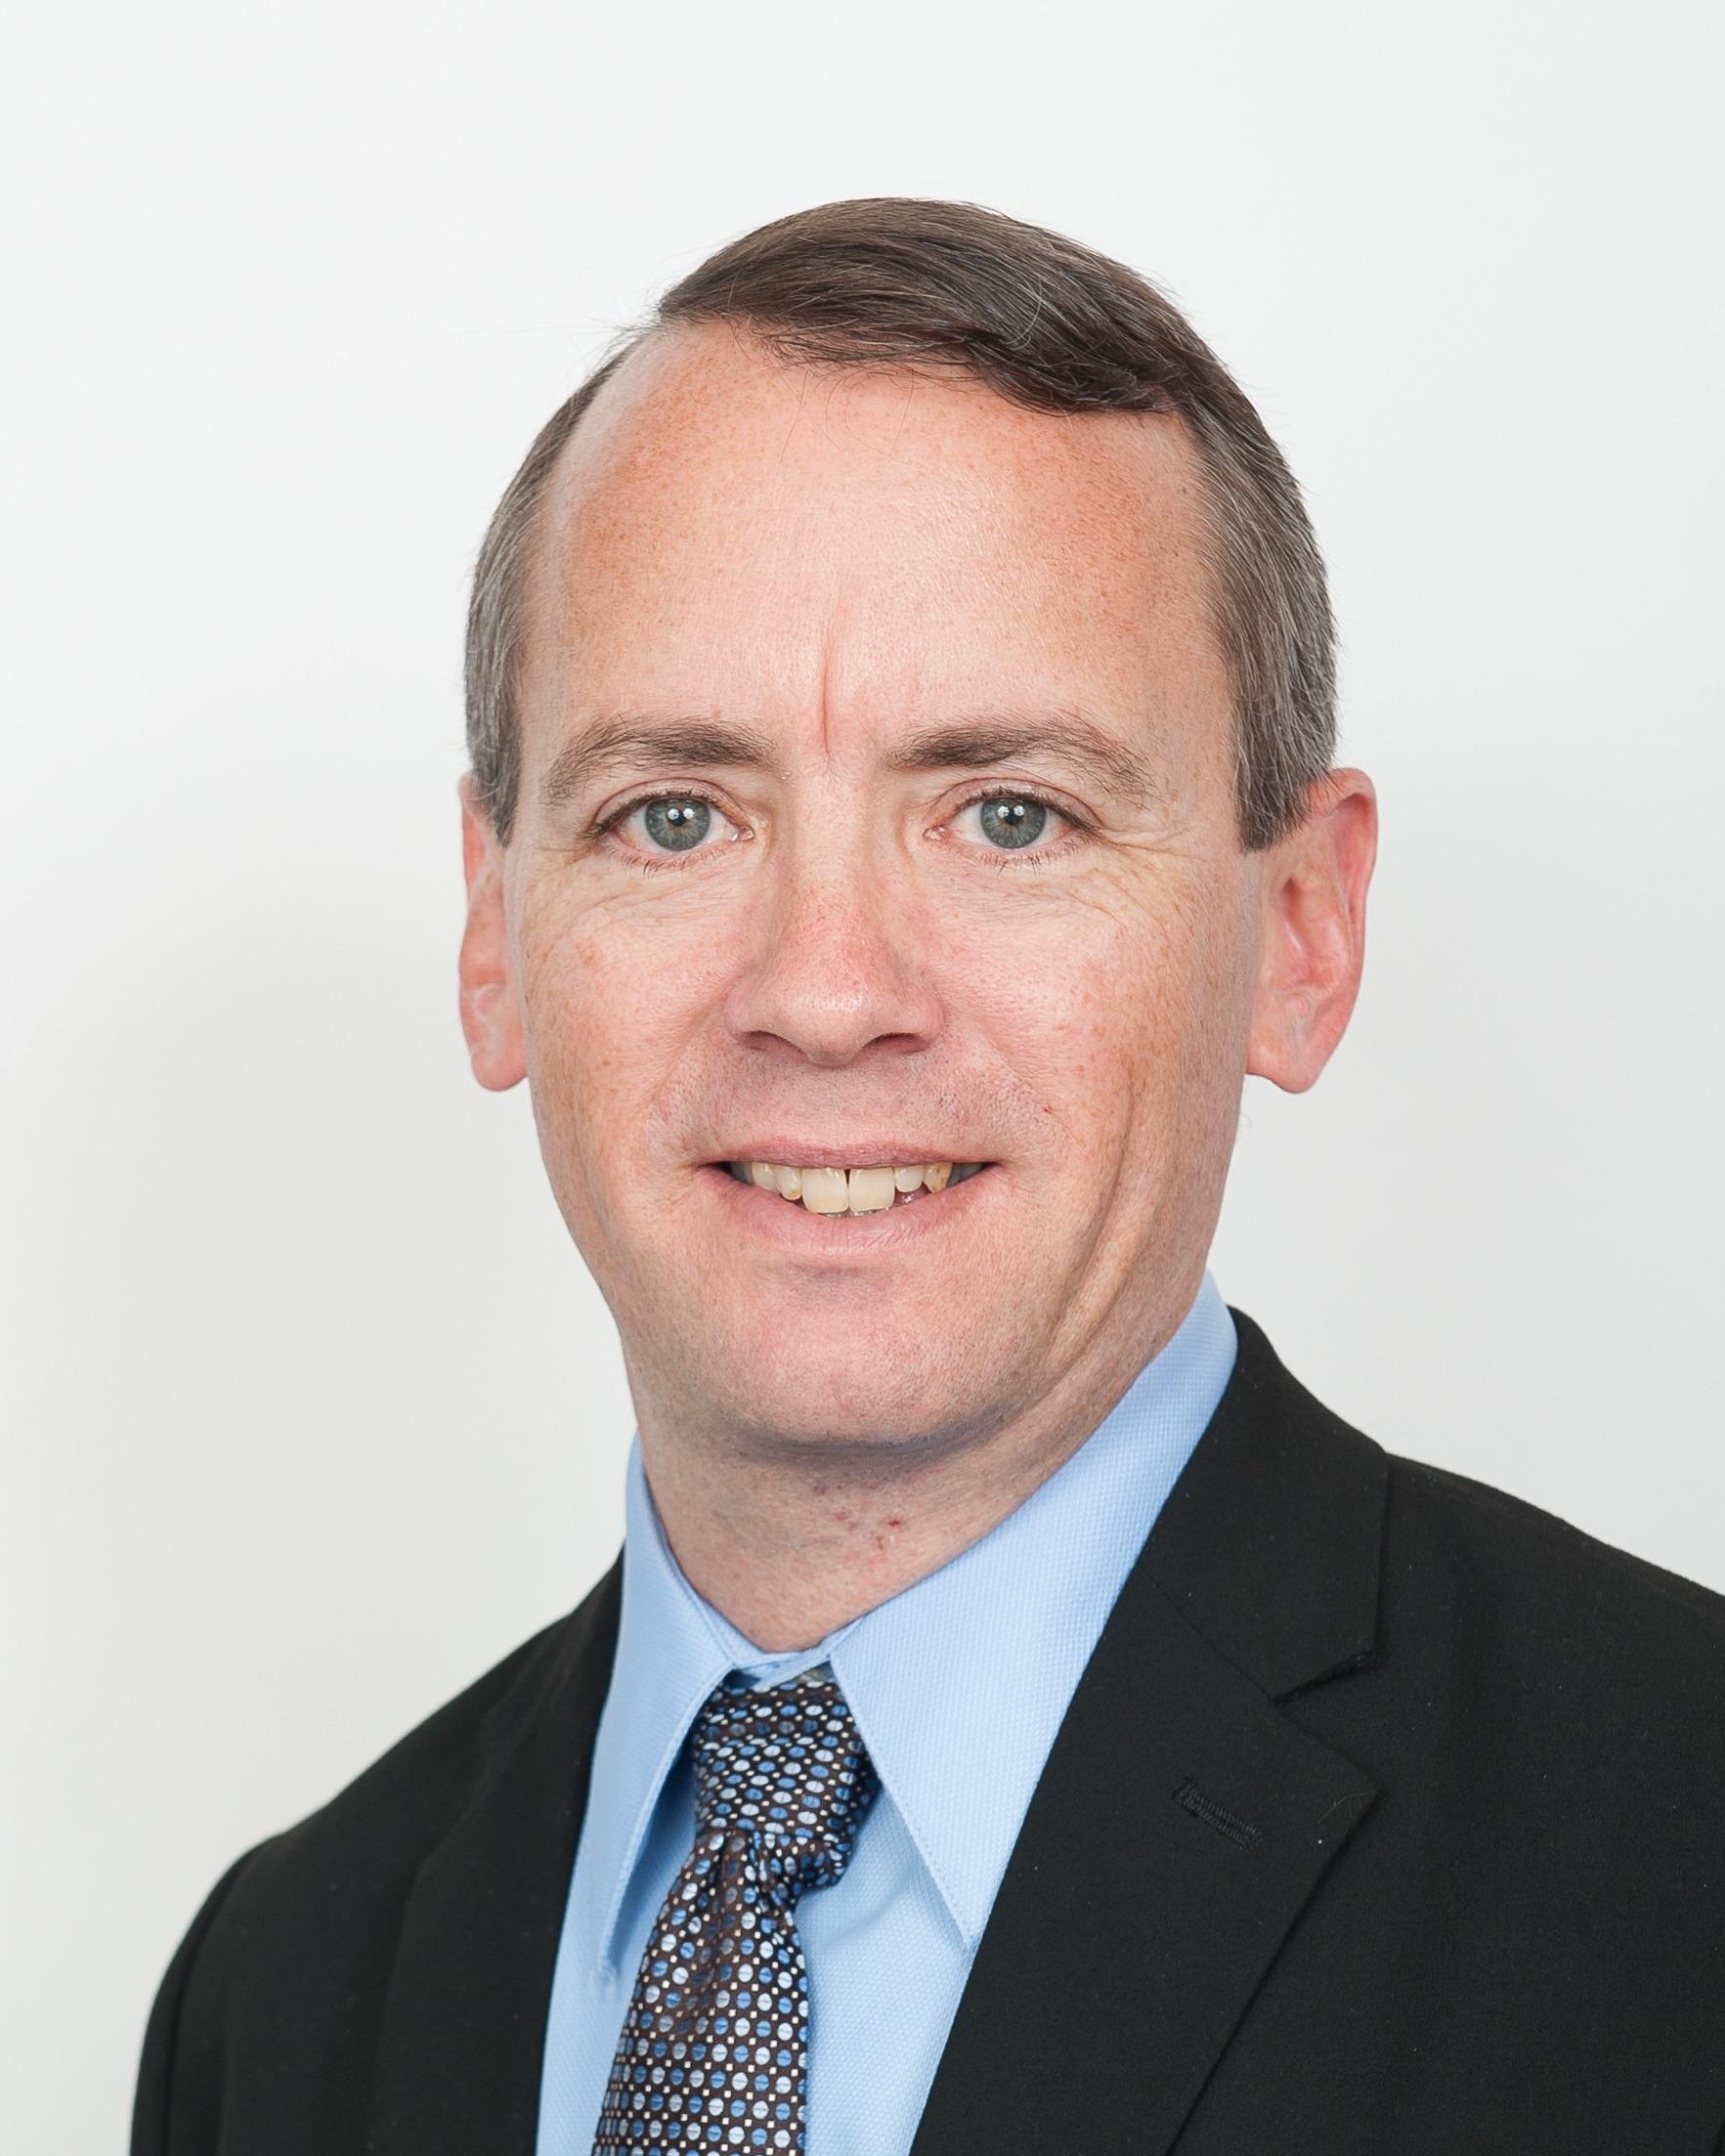 GlobalData John Byrne, Huawei 5G intellectual property